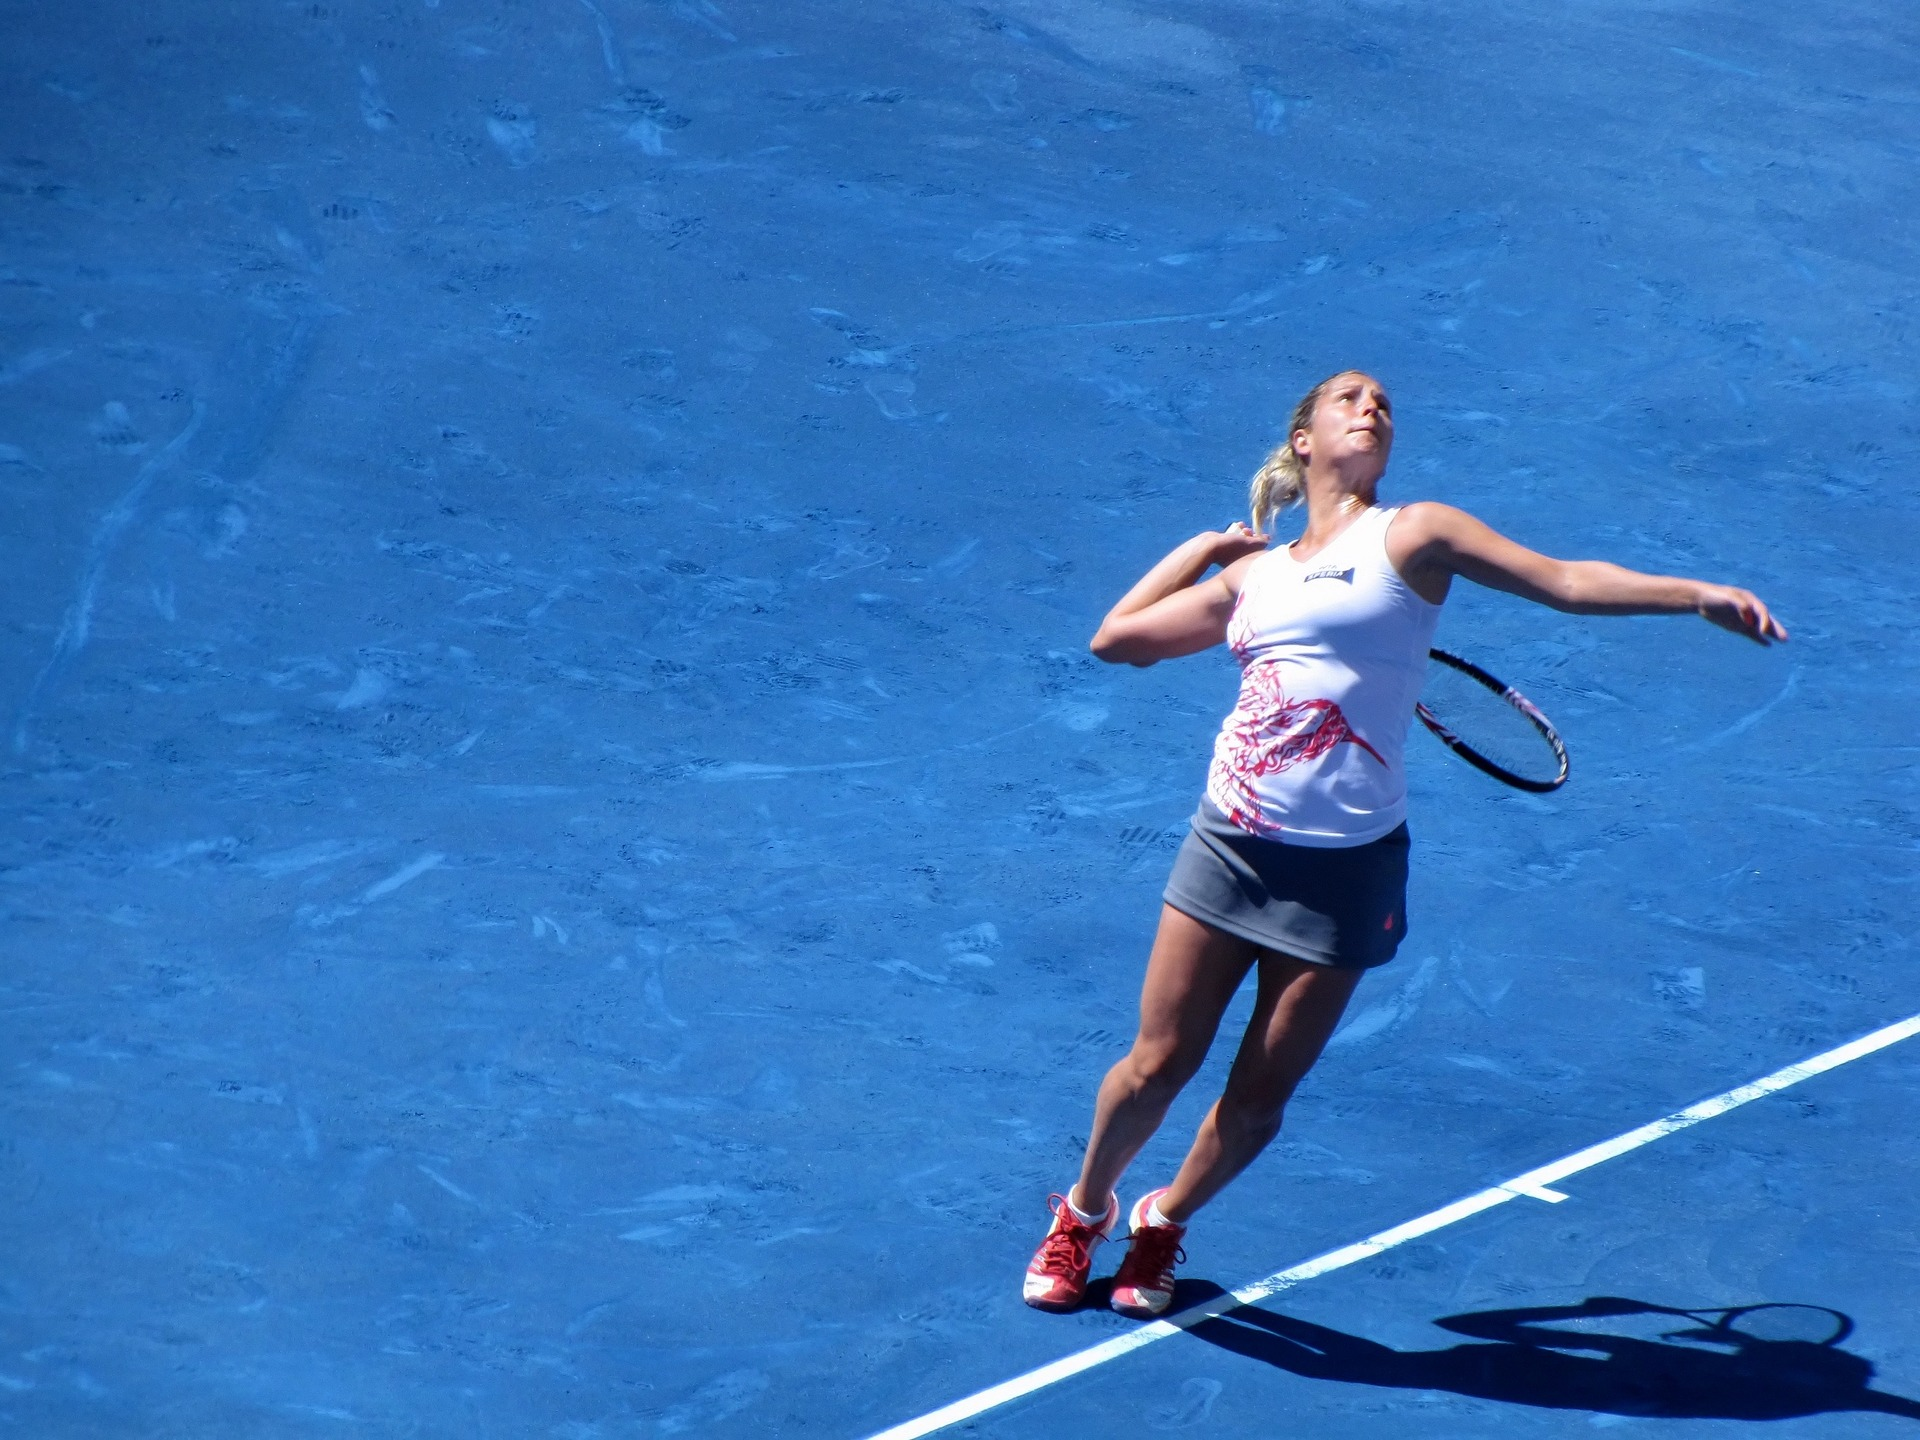 tennis-1403051_1920